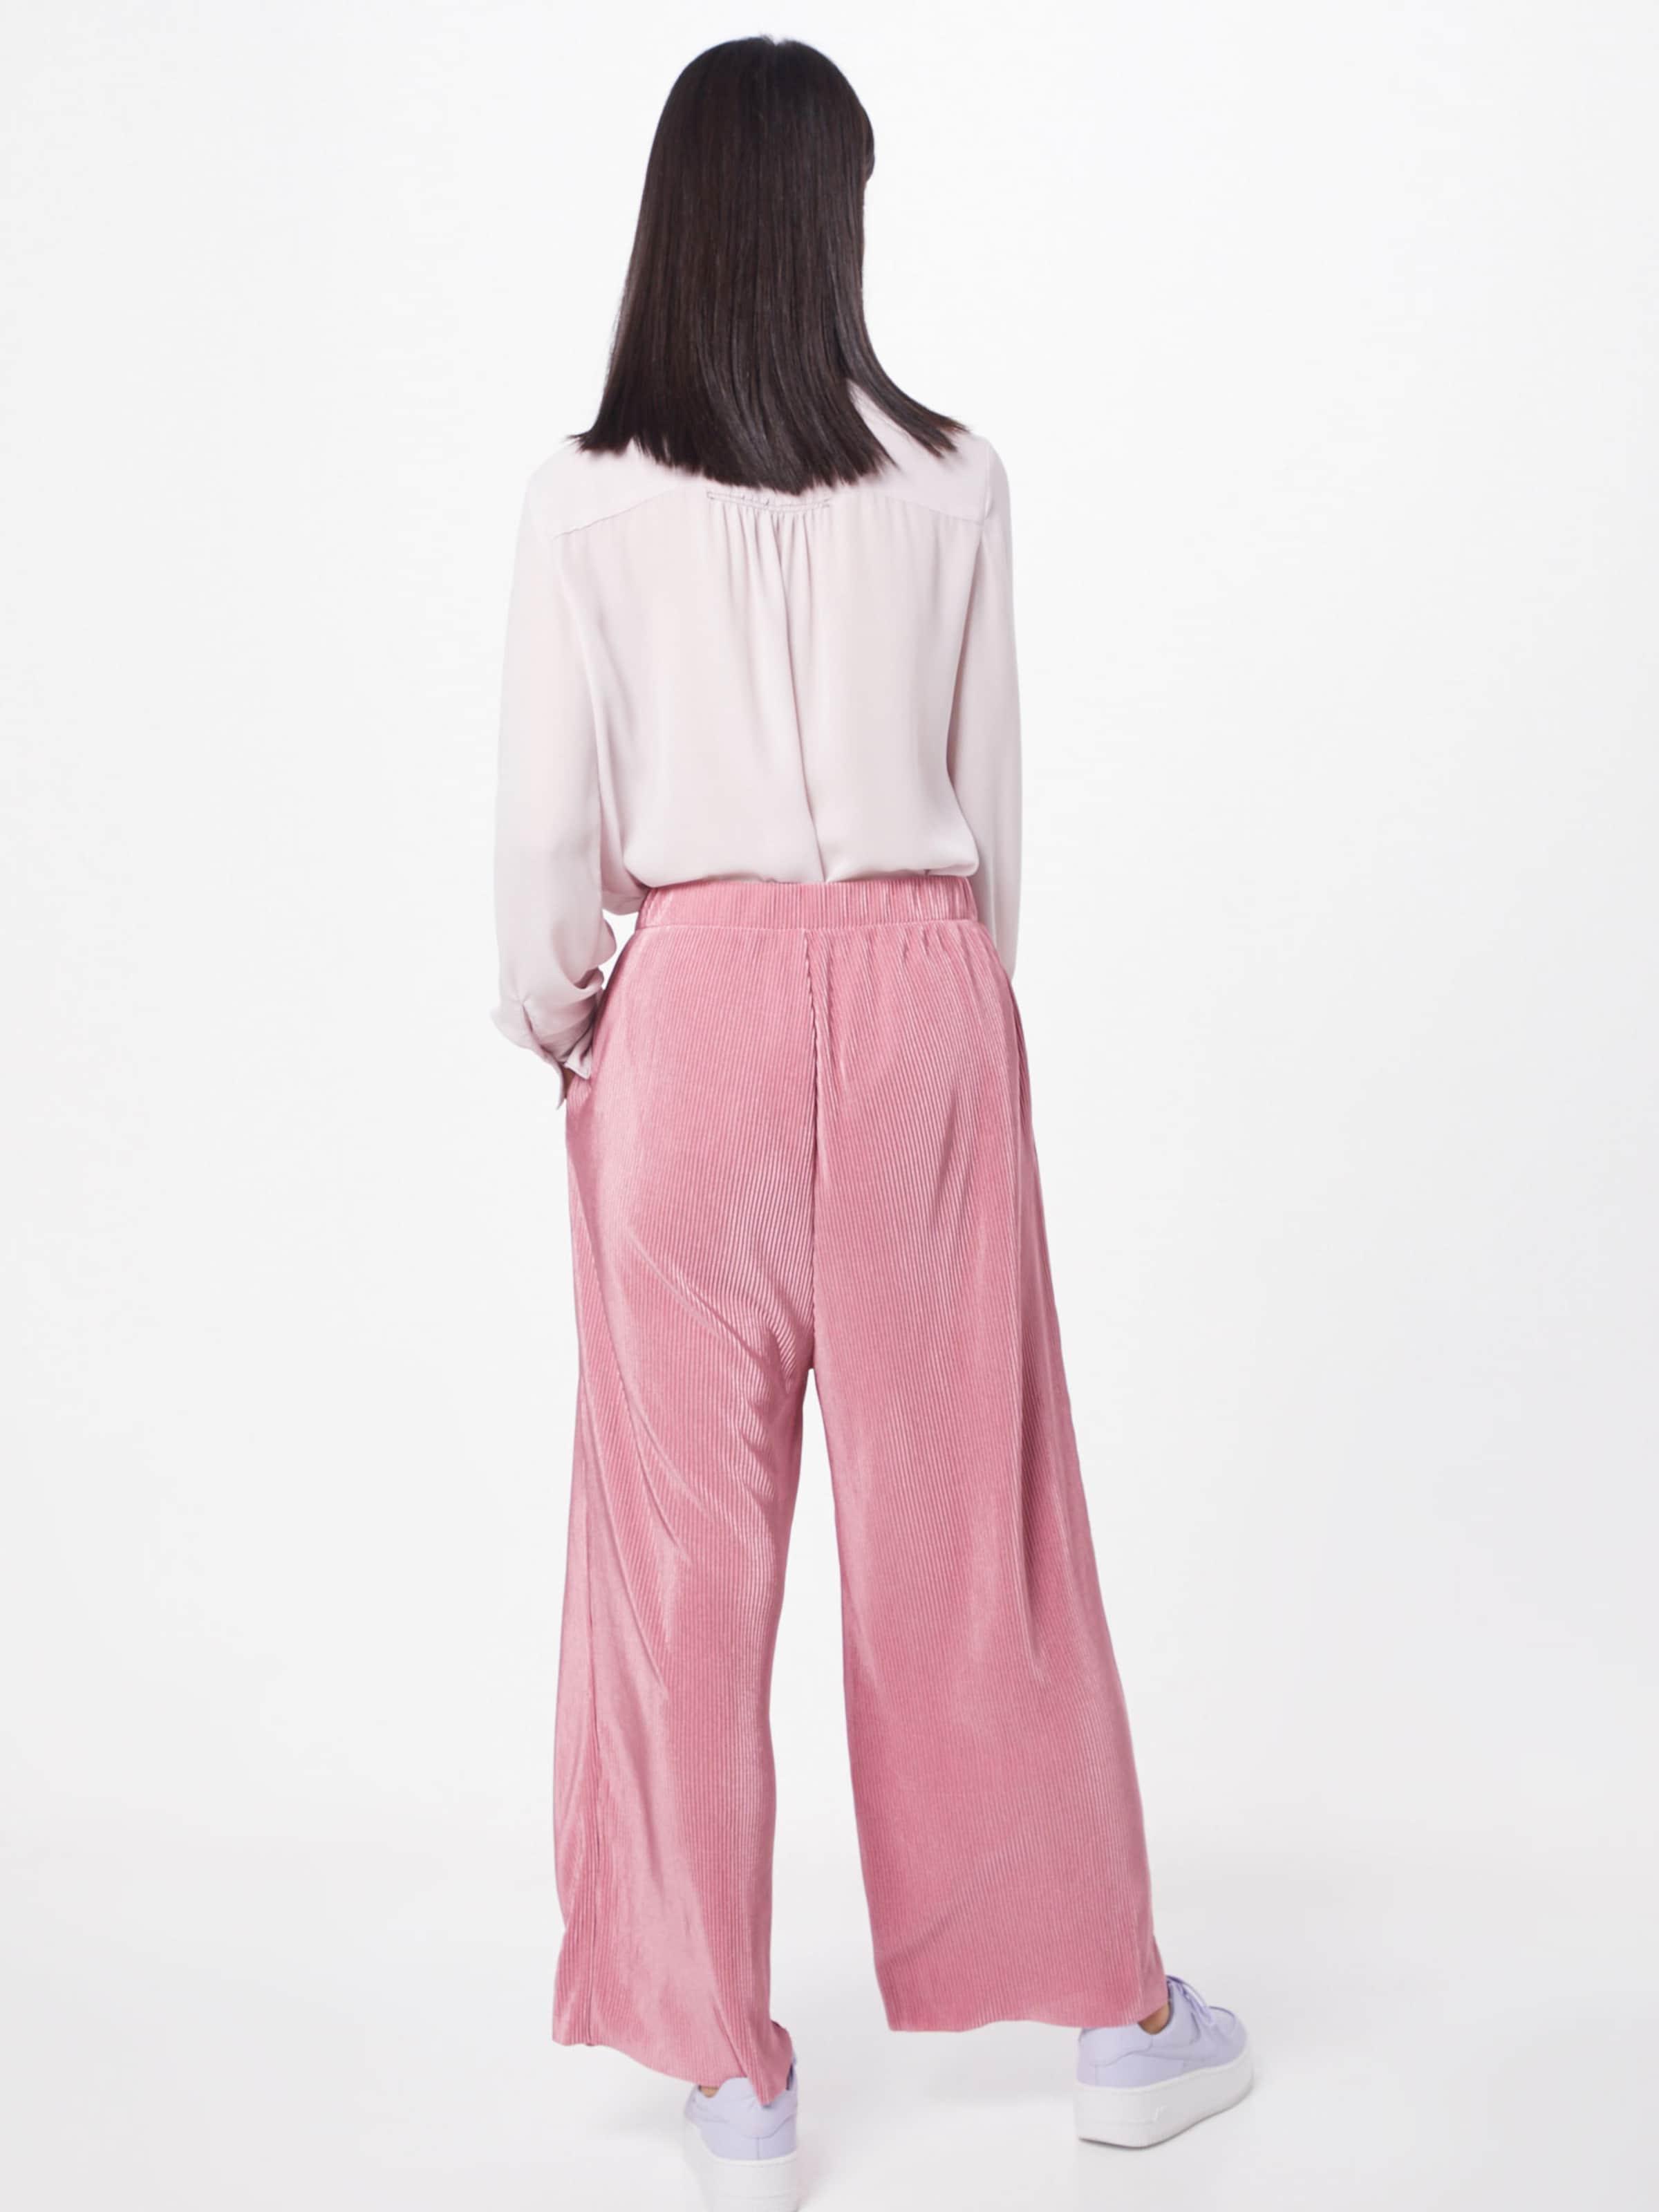 Q Designed s By Ancienne Rose Pantalon En F1JKTlc